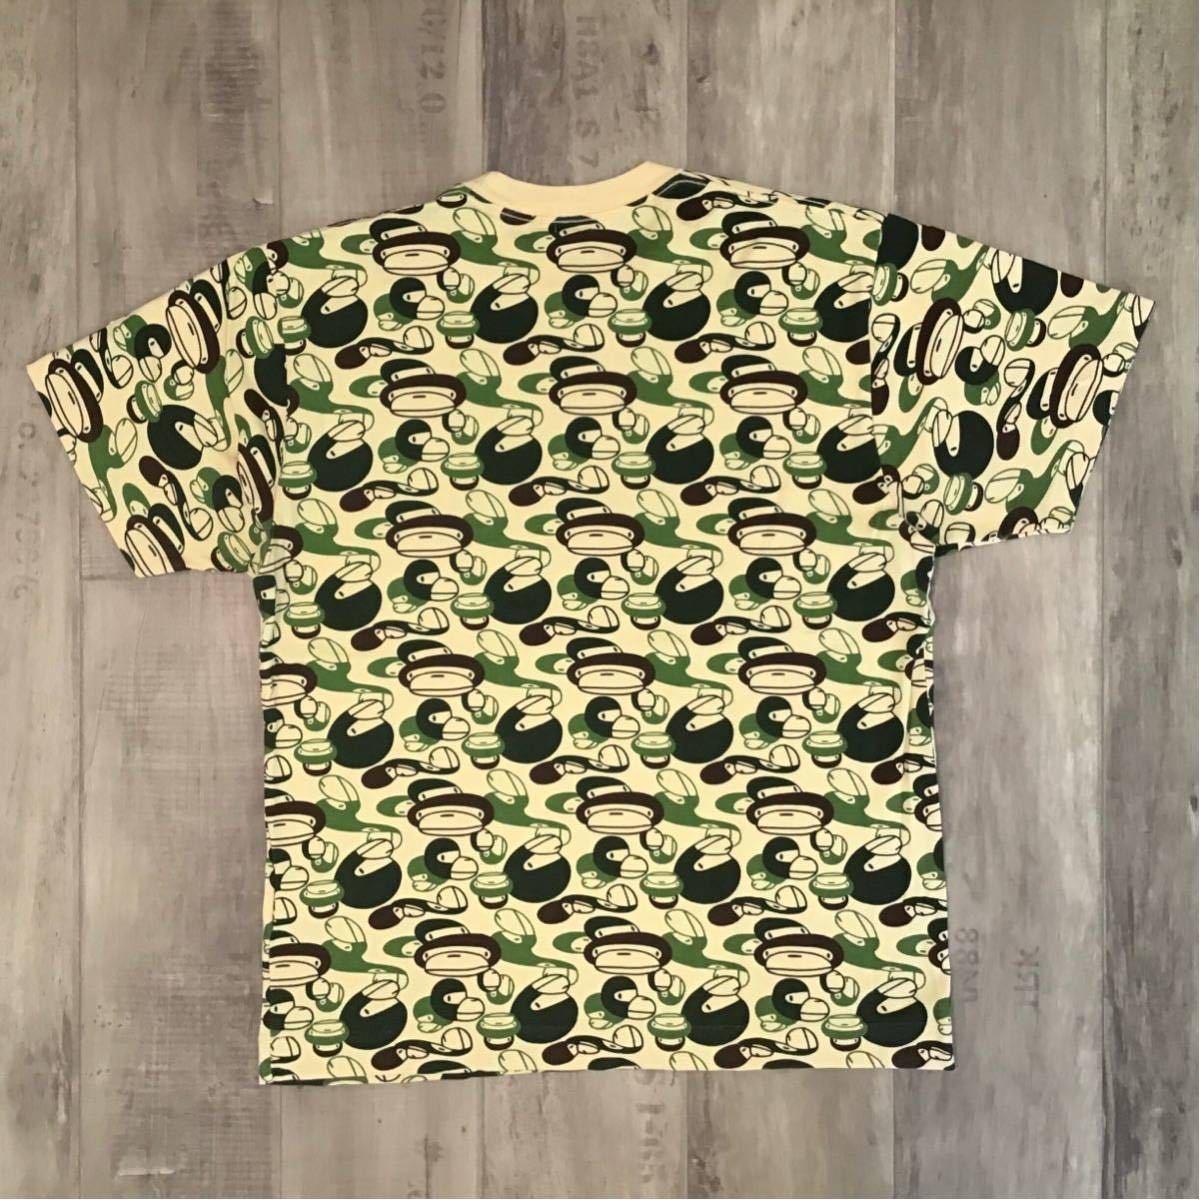 milo camo 総柄 Tシャツ Mサイズ a bathing ape BAPE エイプ ベイプ アベイシングエイプ マイロ 迷彩 NIGO 8t32